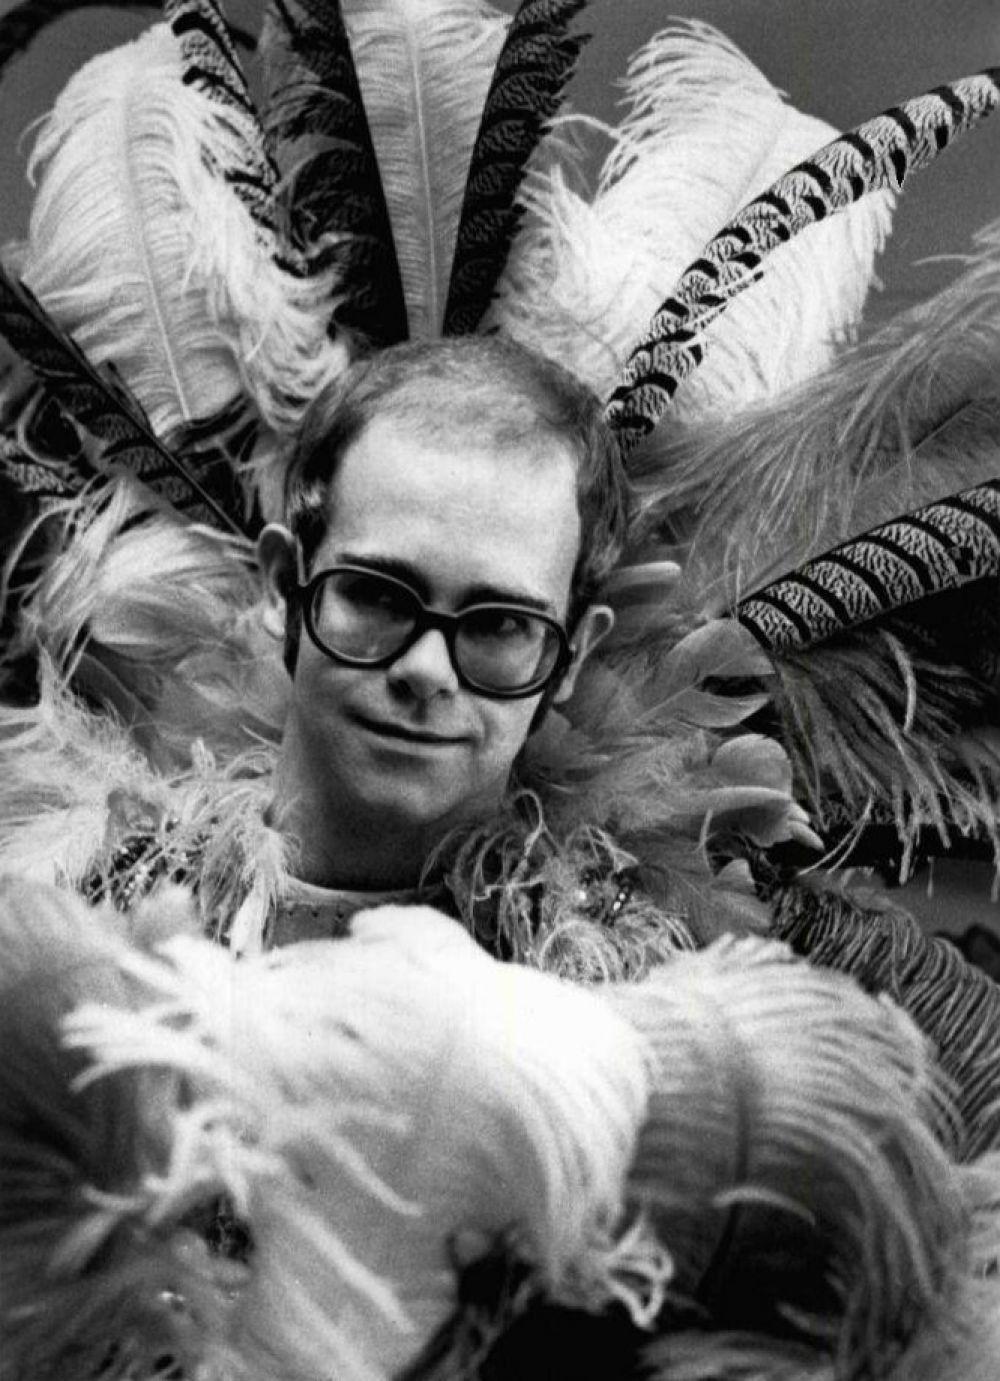 Элтон Джон перед концертом в 1975 году.